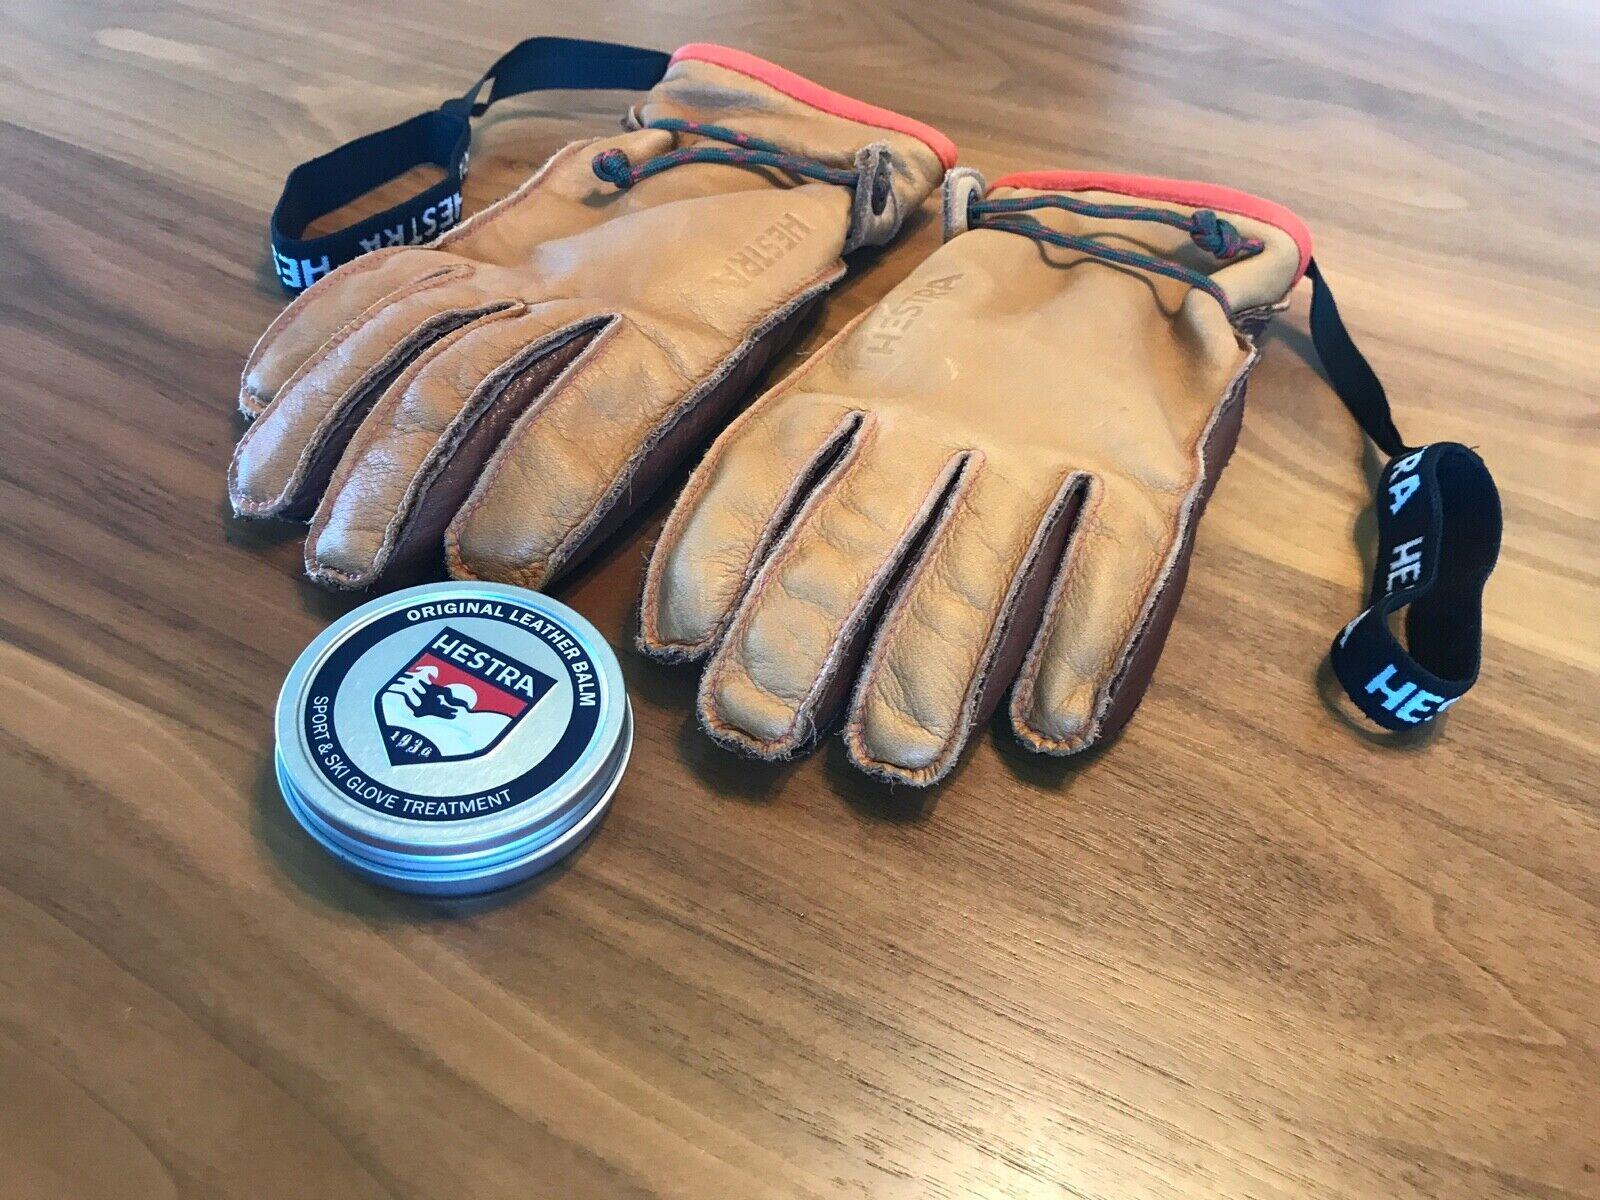 Hestra Glove Care Balm Leather Treatment - 60ml Tin